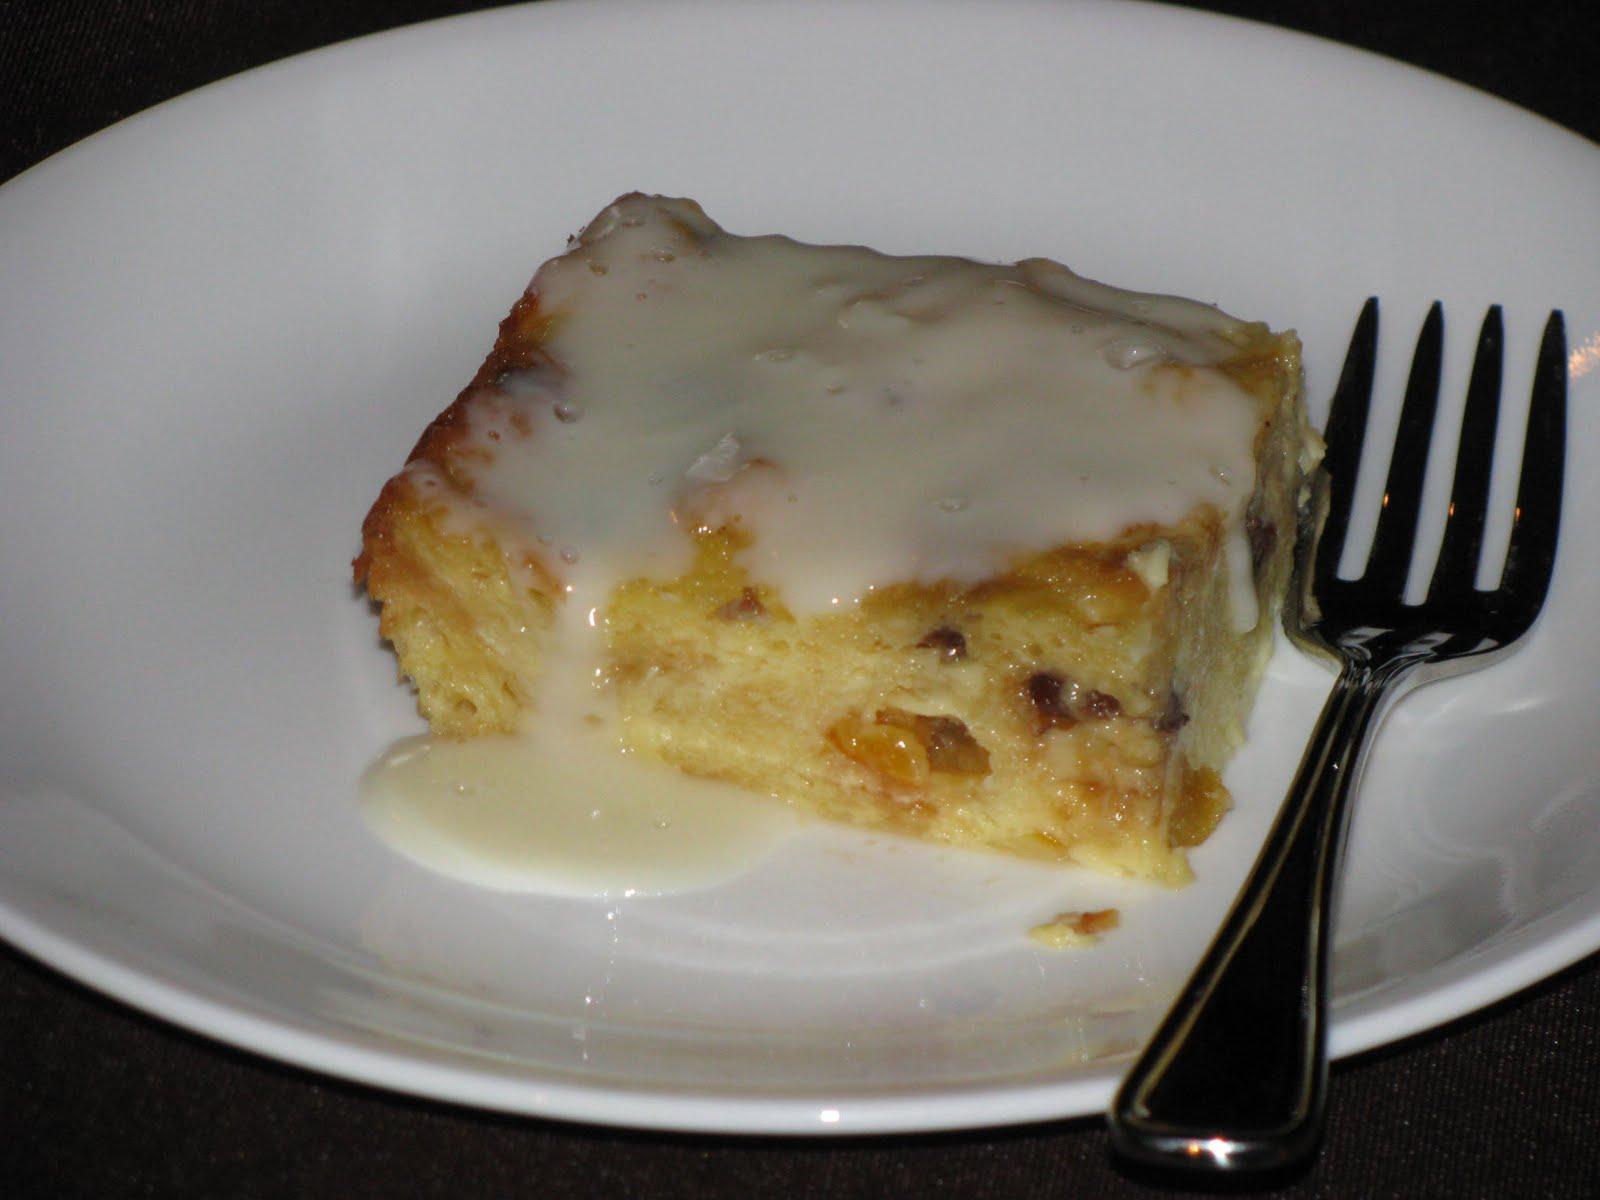 ... las Cucinas de Italia: Panettone Bread Pudding with Amaretto Sauce